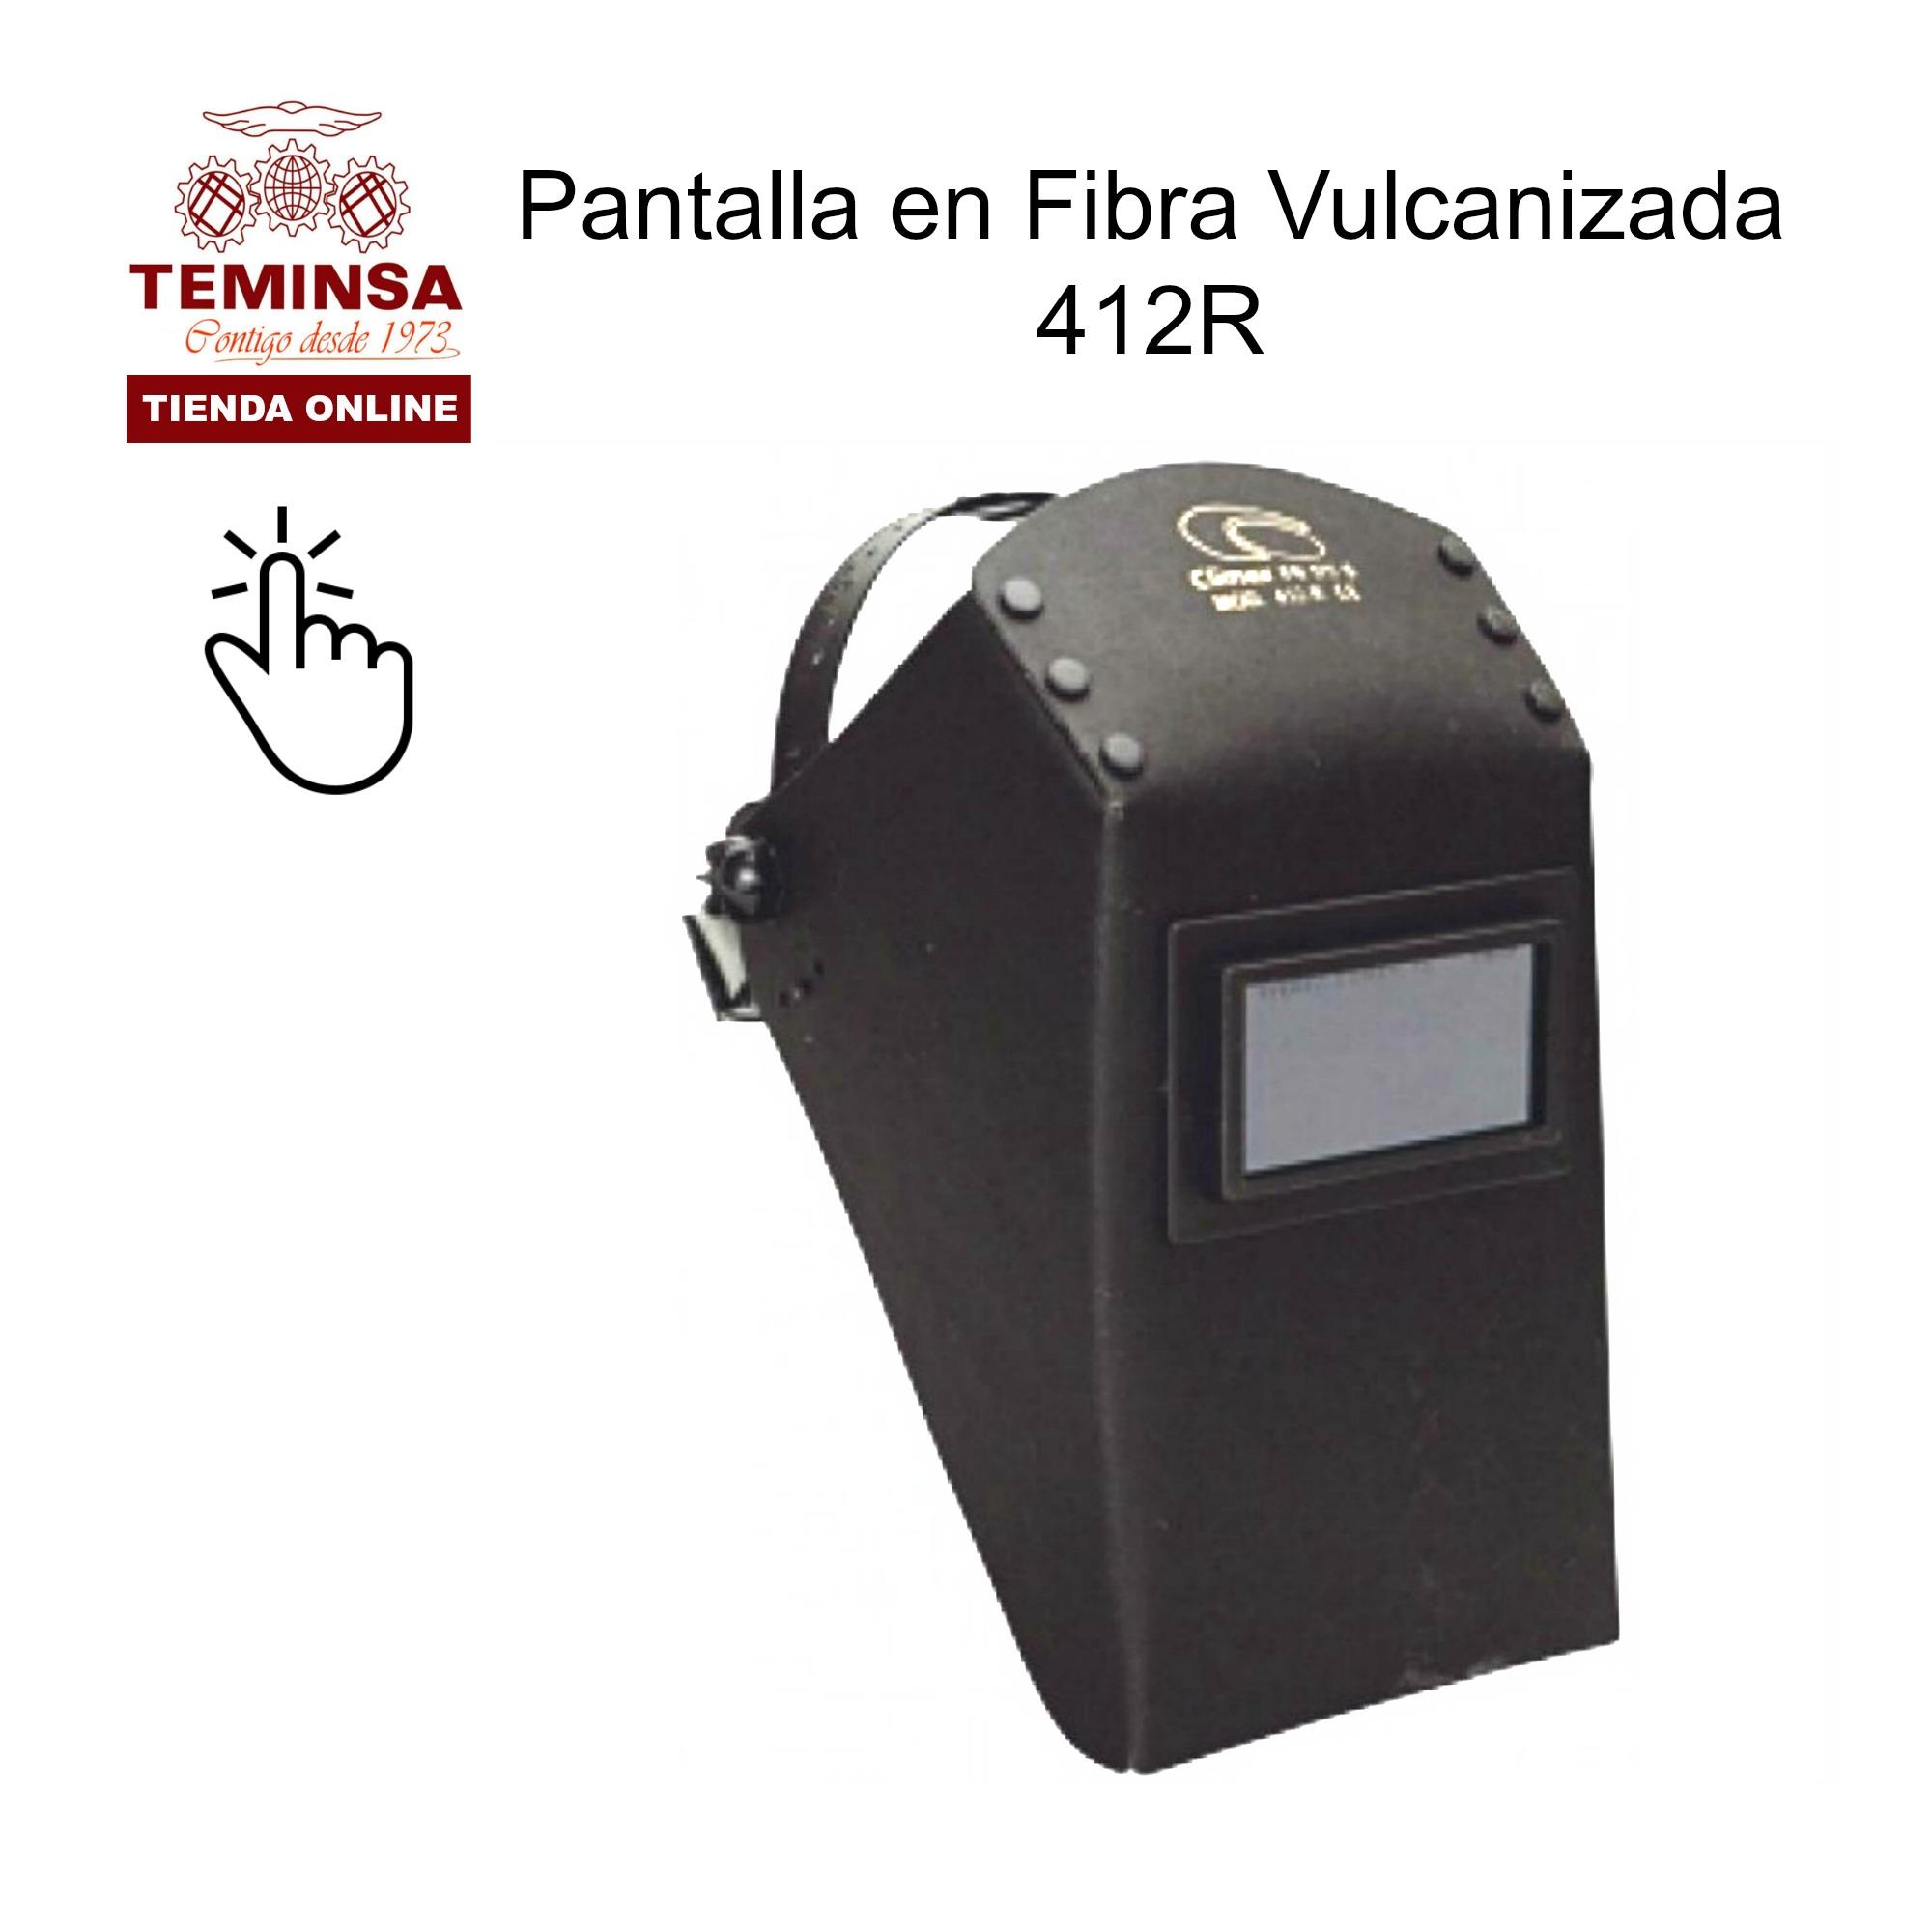 Pantalla Soldador en Fibra Vulcanizada Teminsa Online